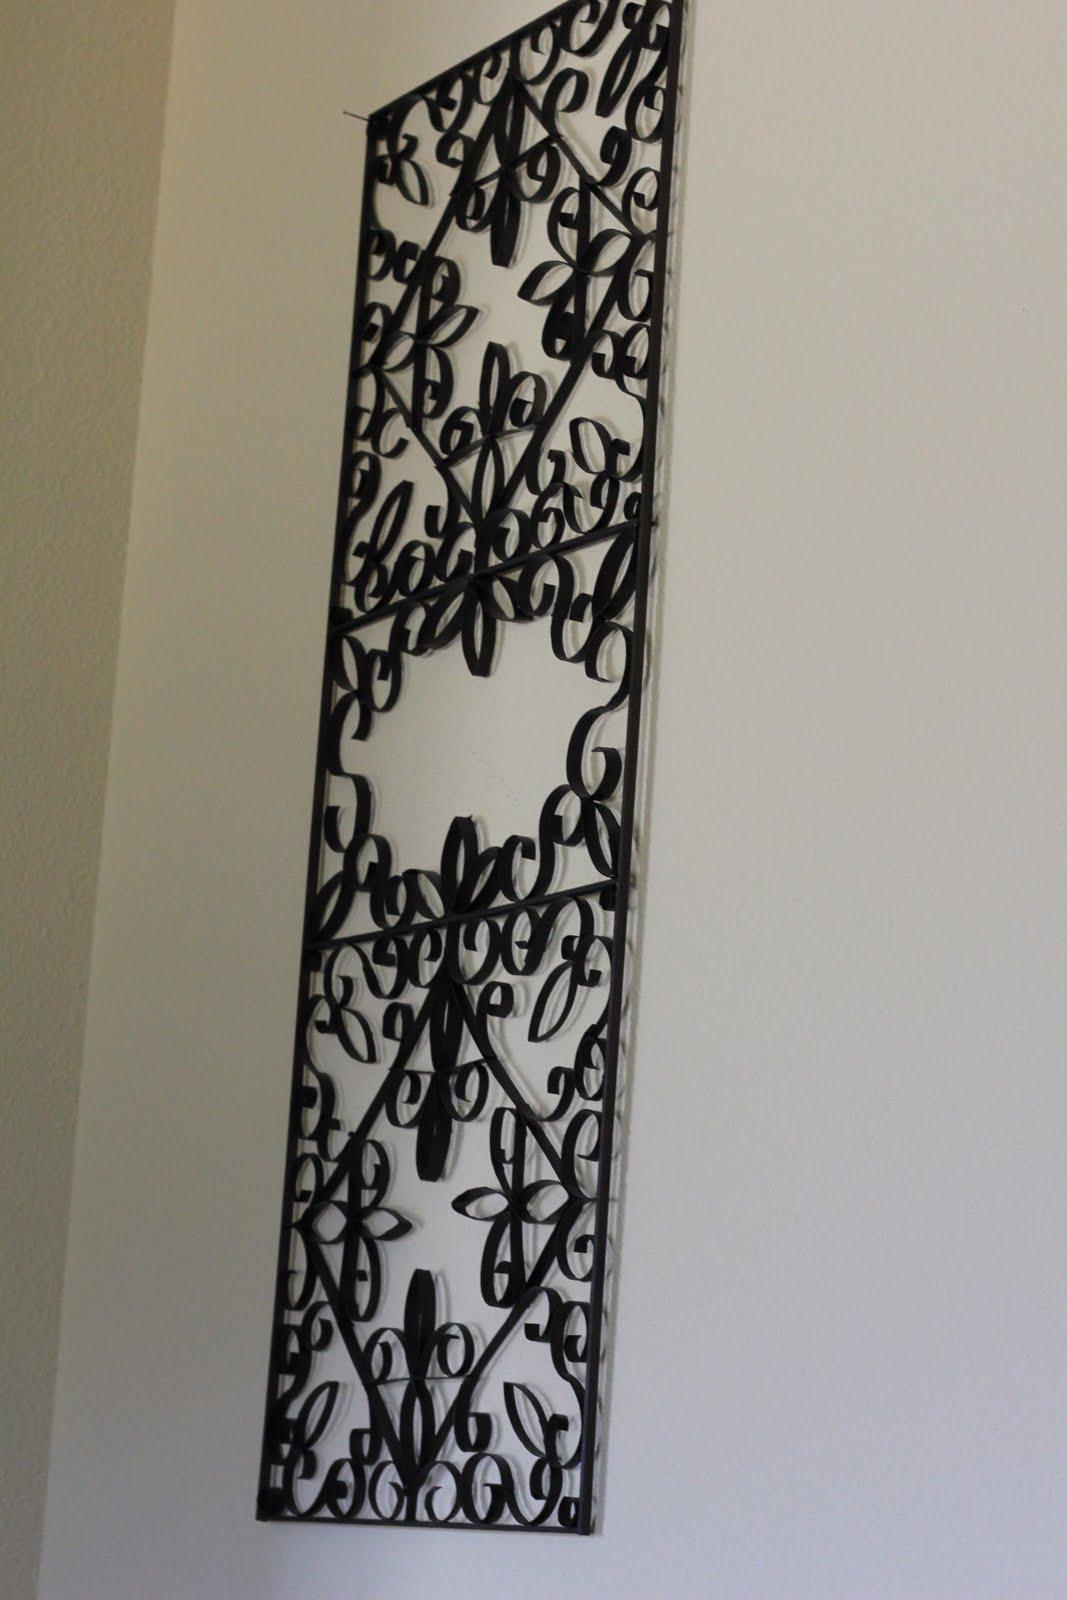 & In my own words: Pinterest 7: Toilet paper roll art